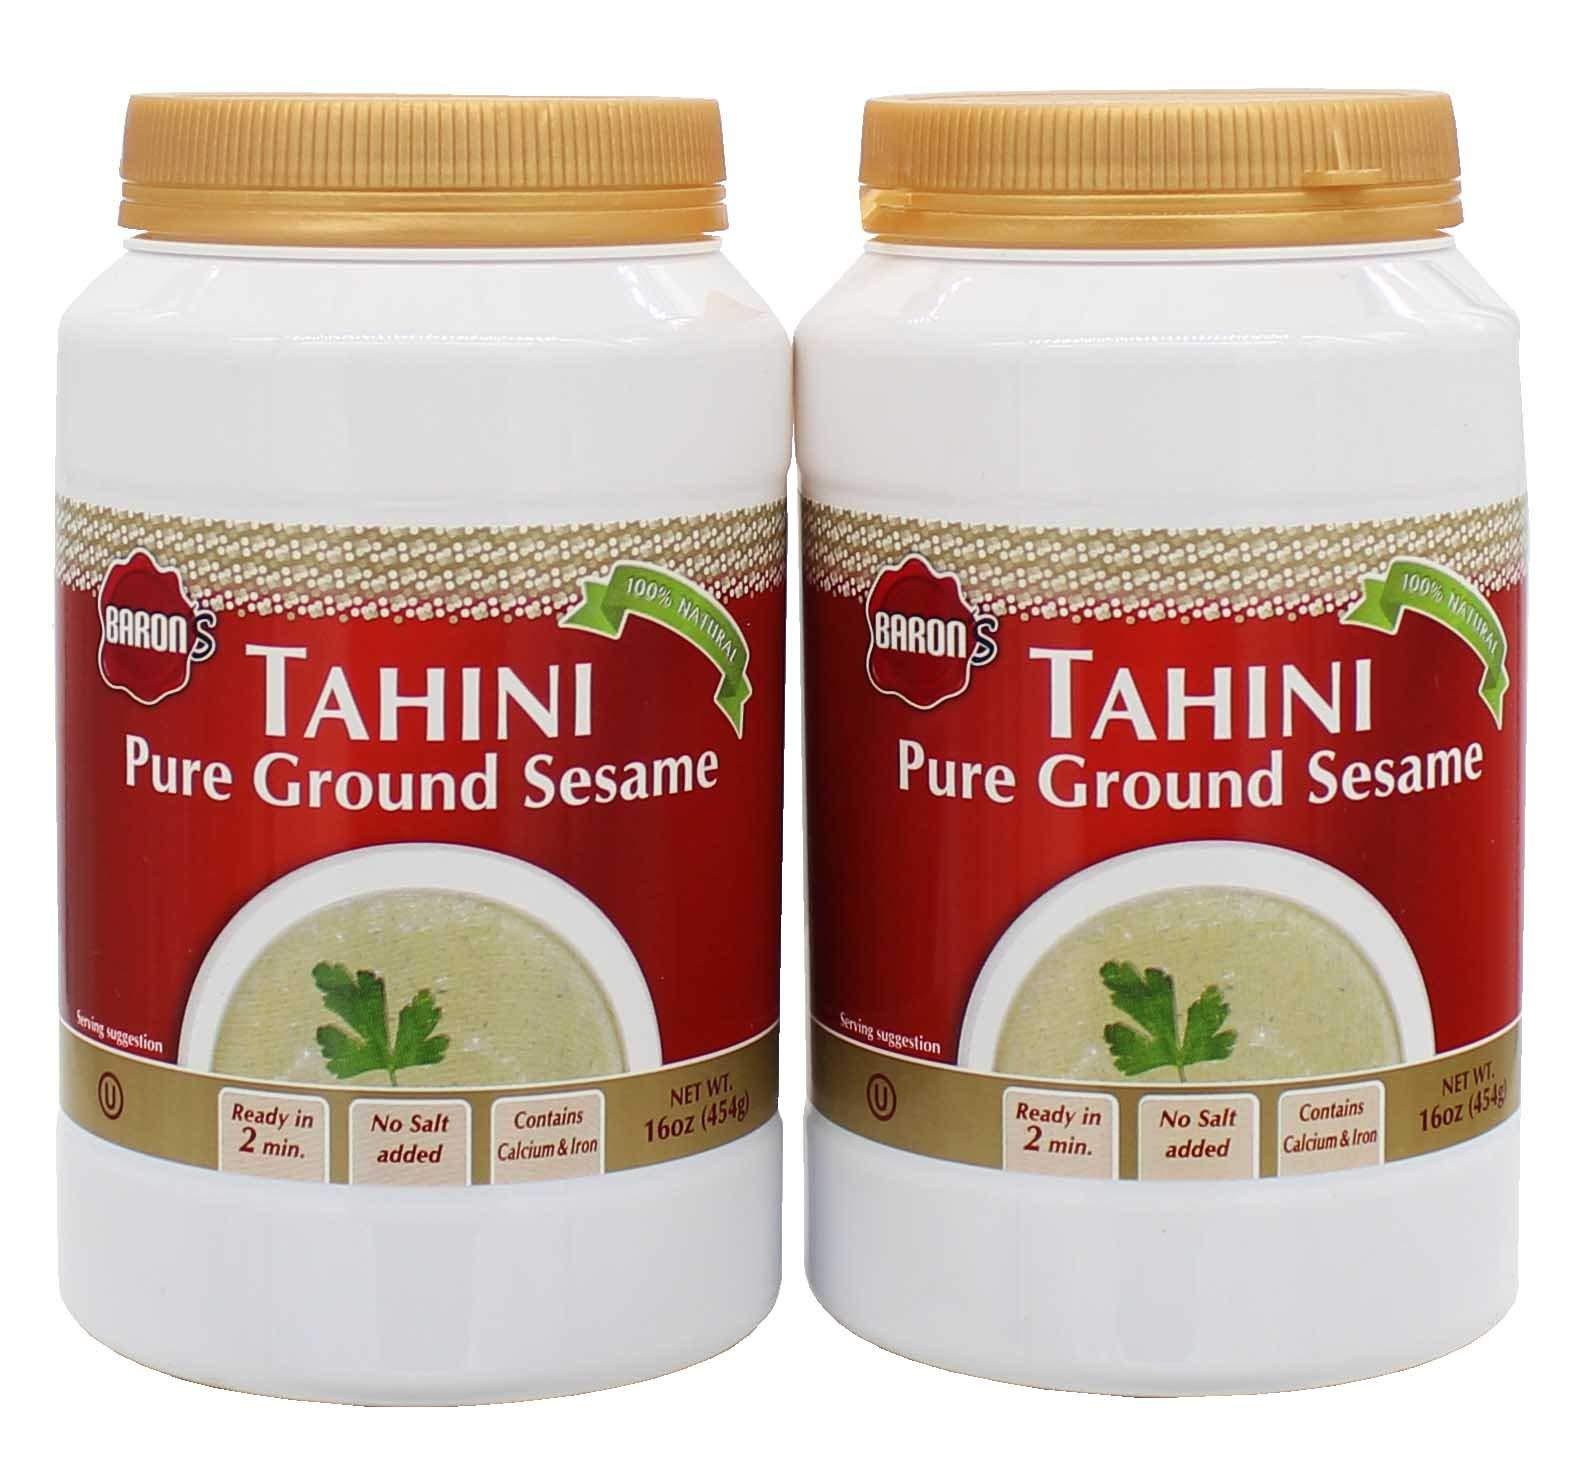 Baron's Kosher 100% Pure Ground Sesame Tahini 16-ounce Jars (Pack of 2). by Baron's